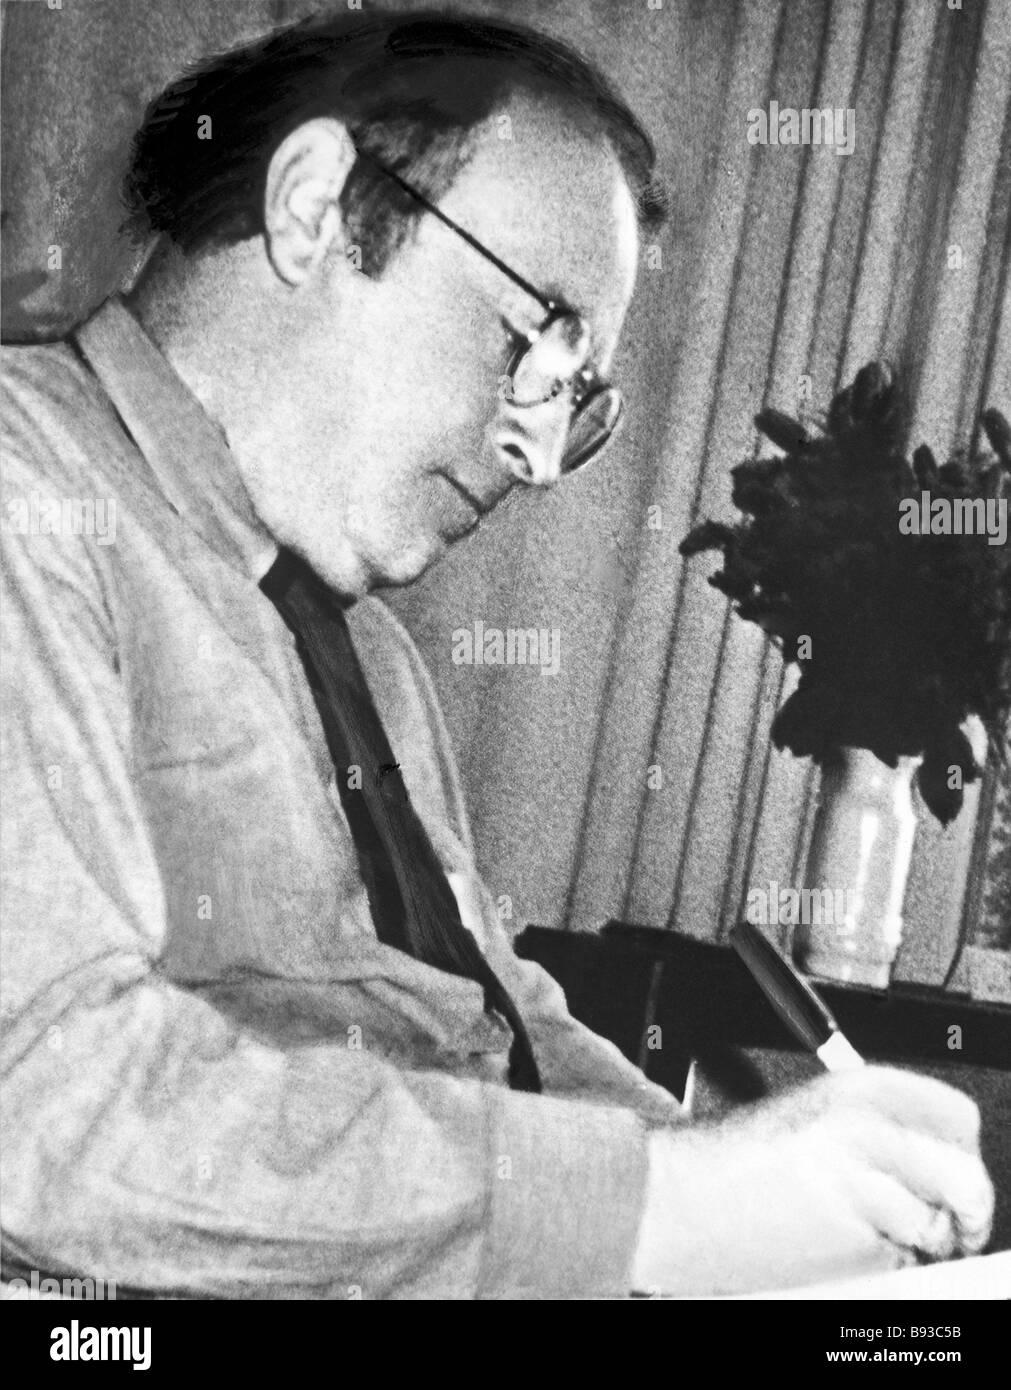 Nobel award winner Joseph Brodsky 1940 1996 at work - Stock Image